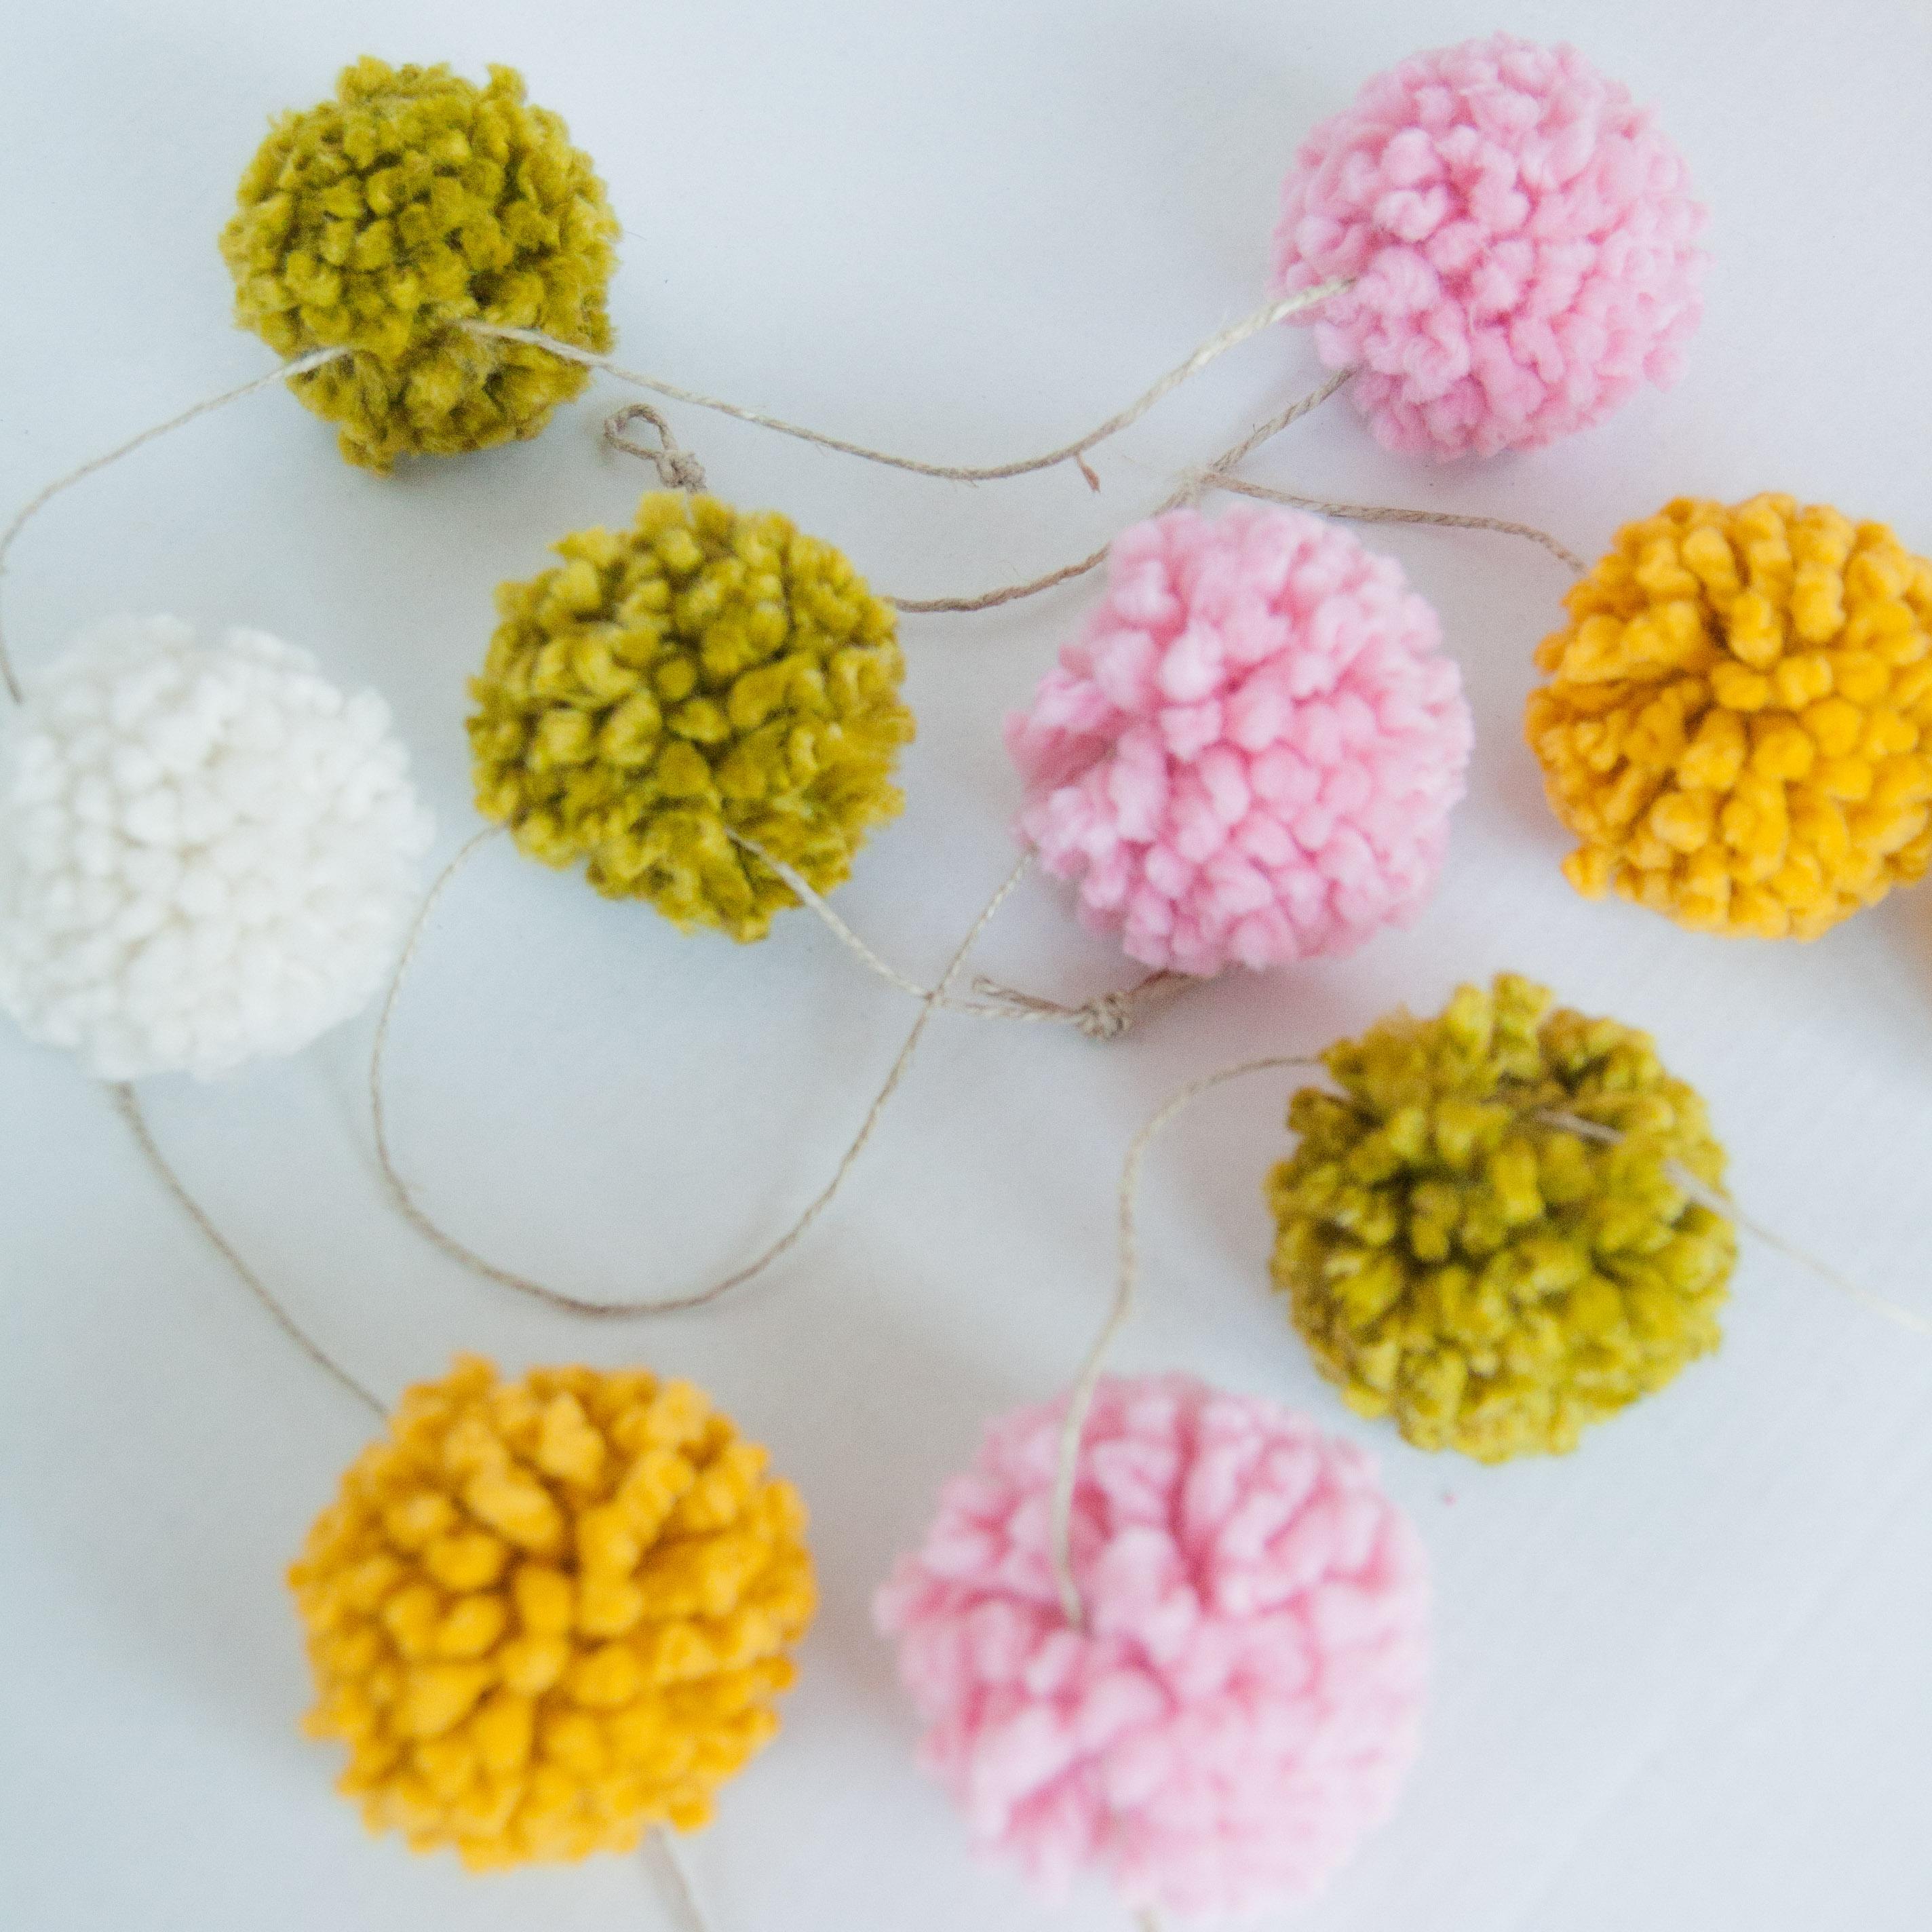 Handmade Yarn Pom Pom Garland